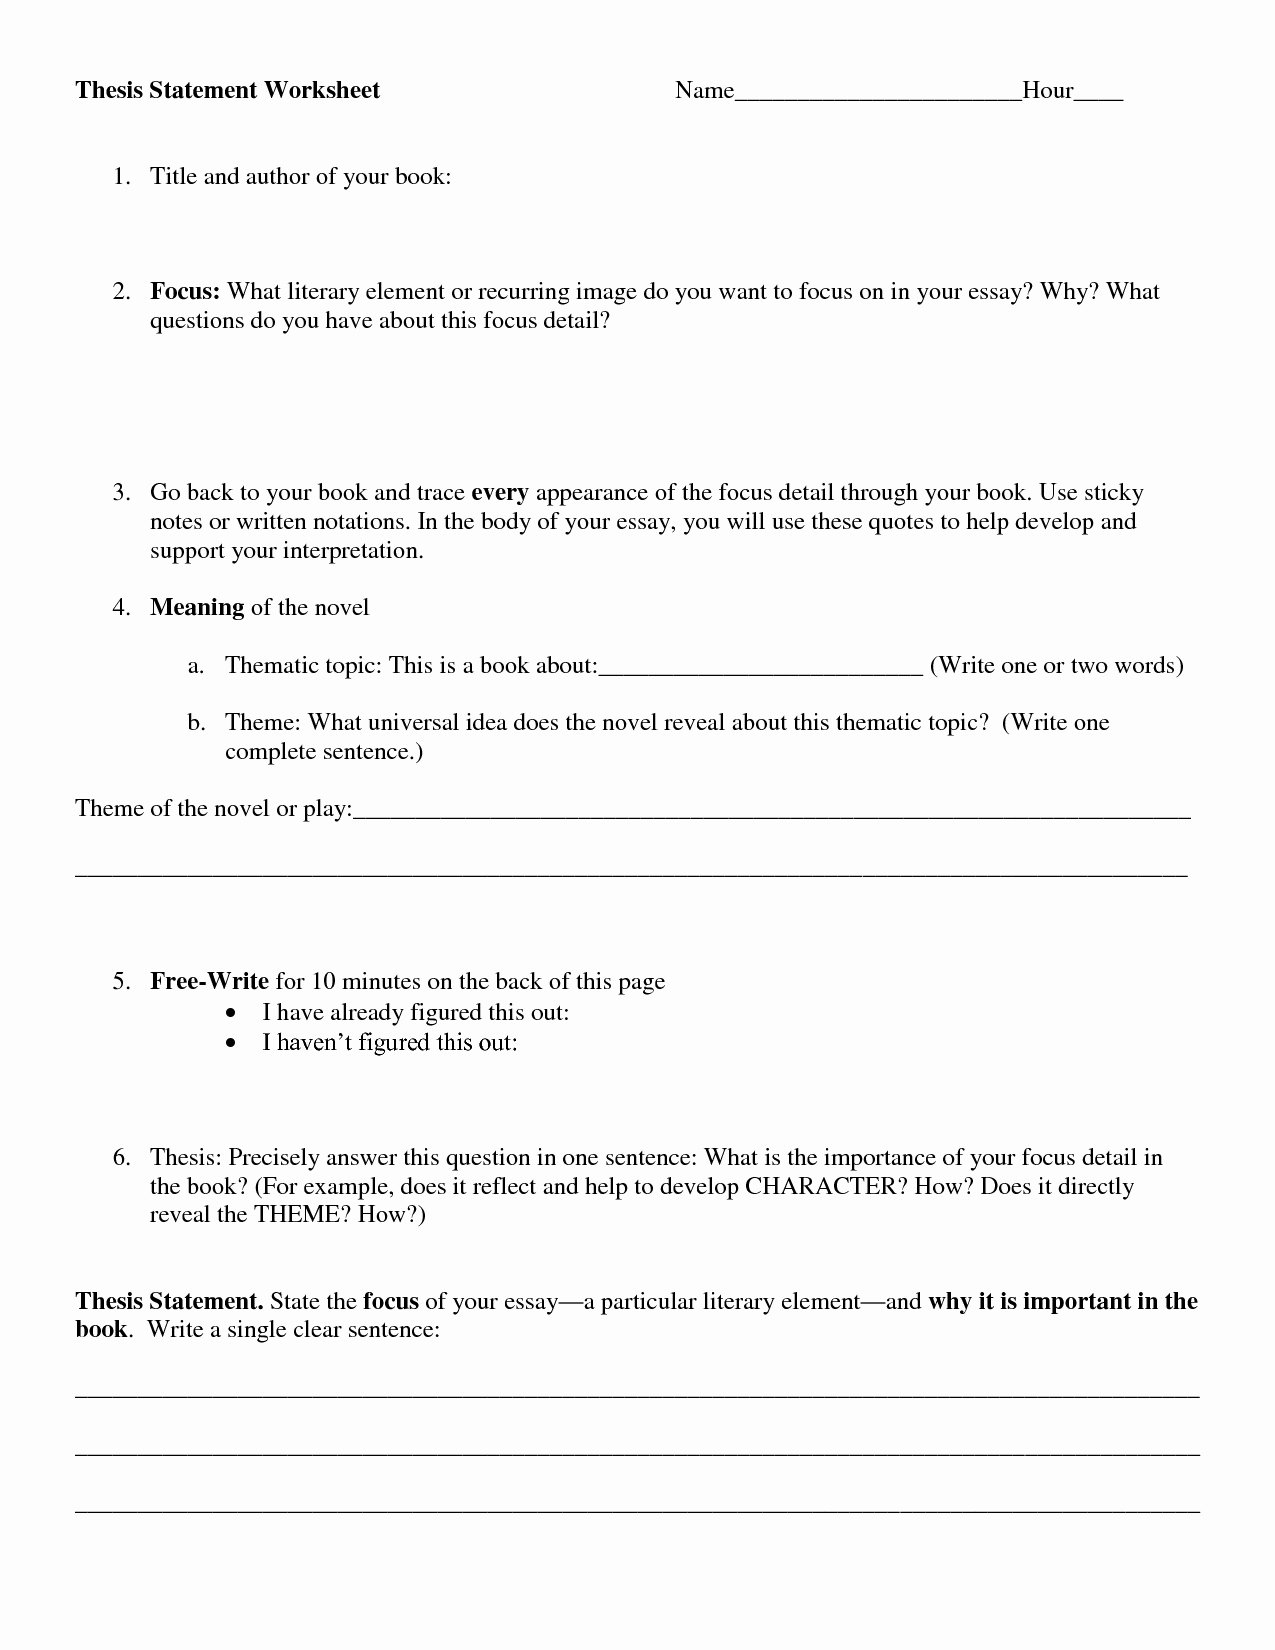 Identifying thesis Statement Worksheet Luxury Argument Essay thesis Worksheet